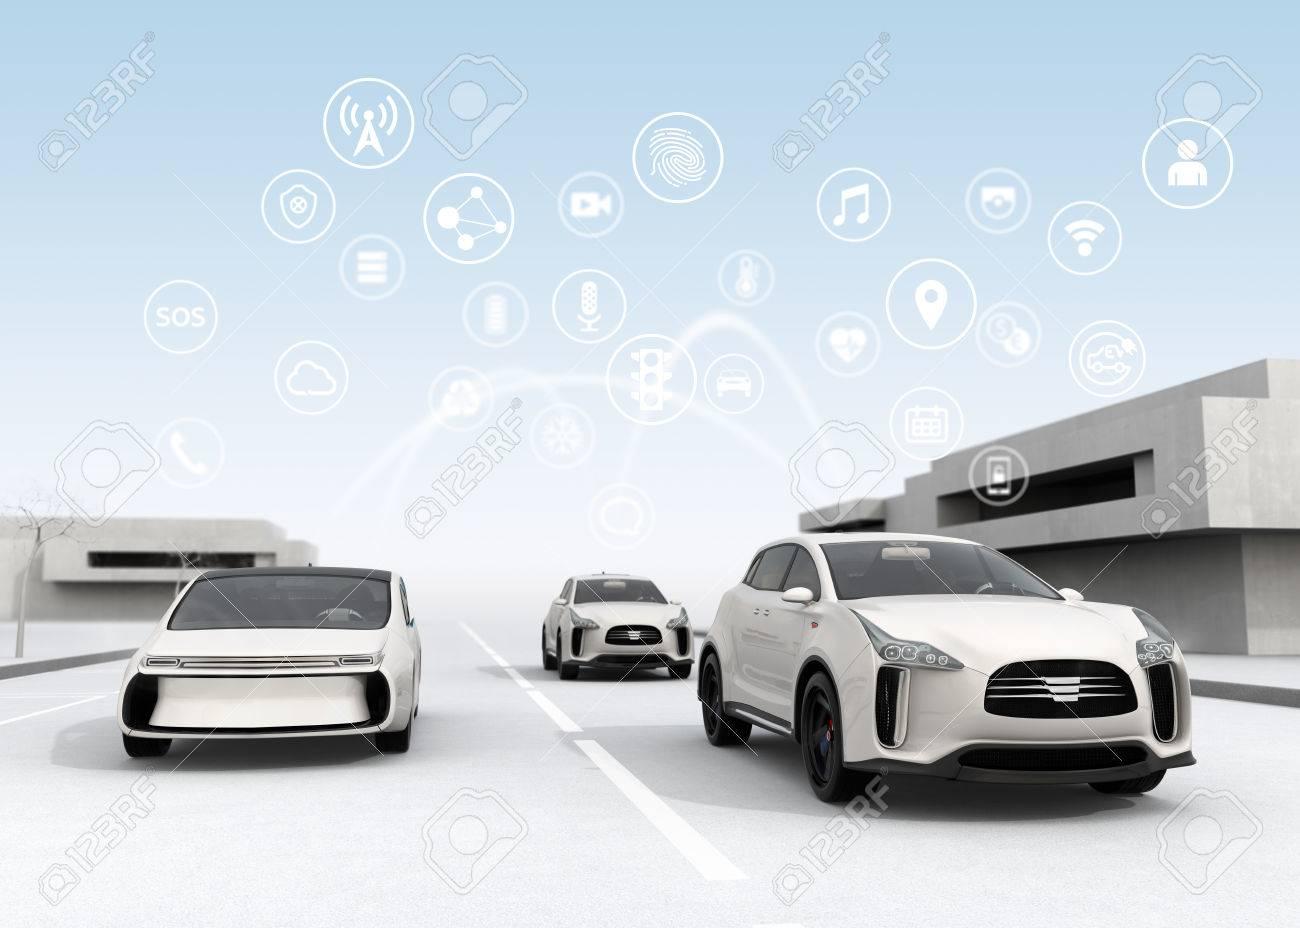 Connected cars and autonomous cars concept. 3D rendering image. - 66154672